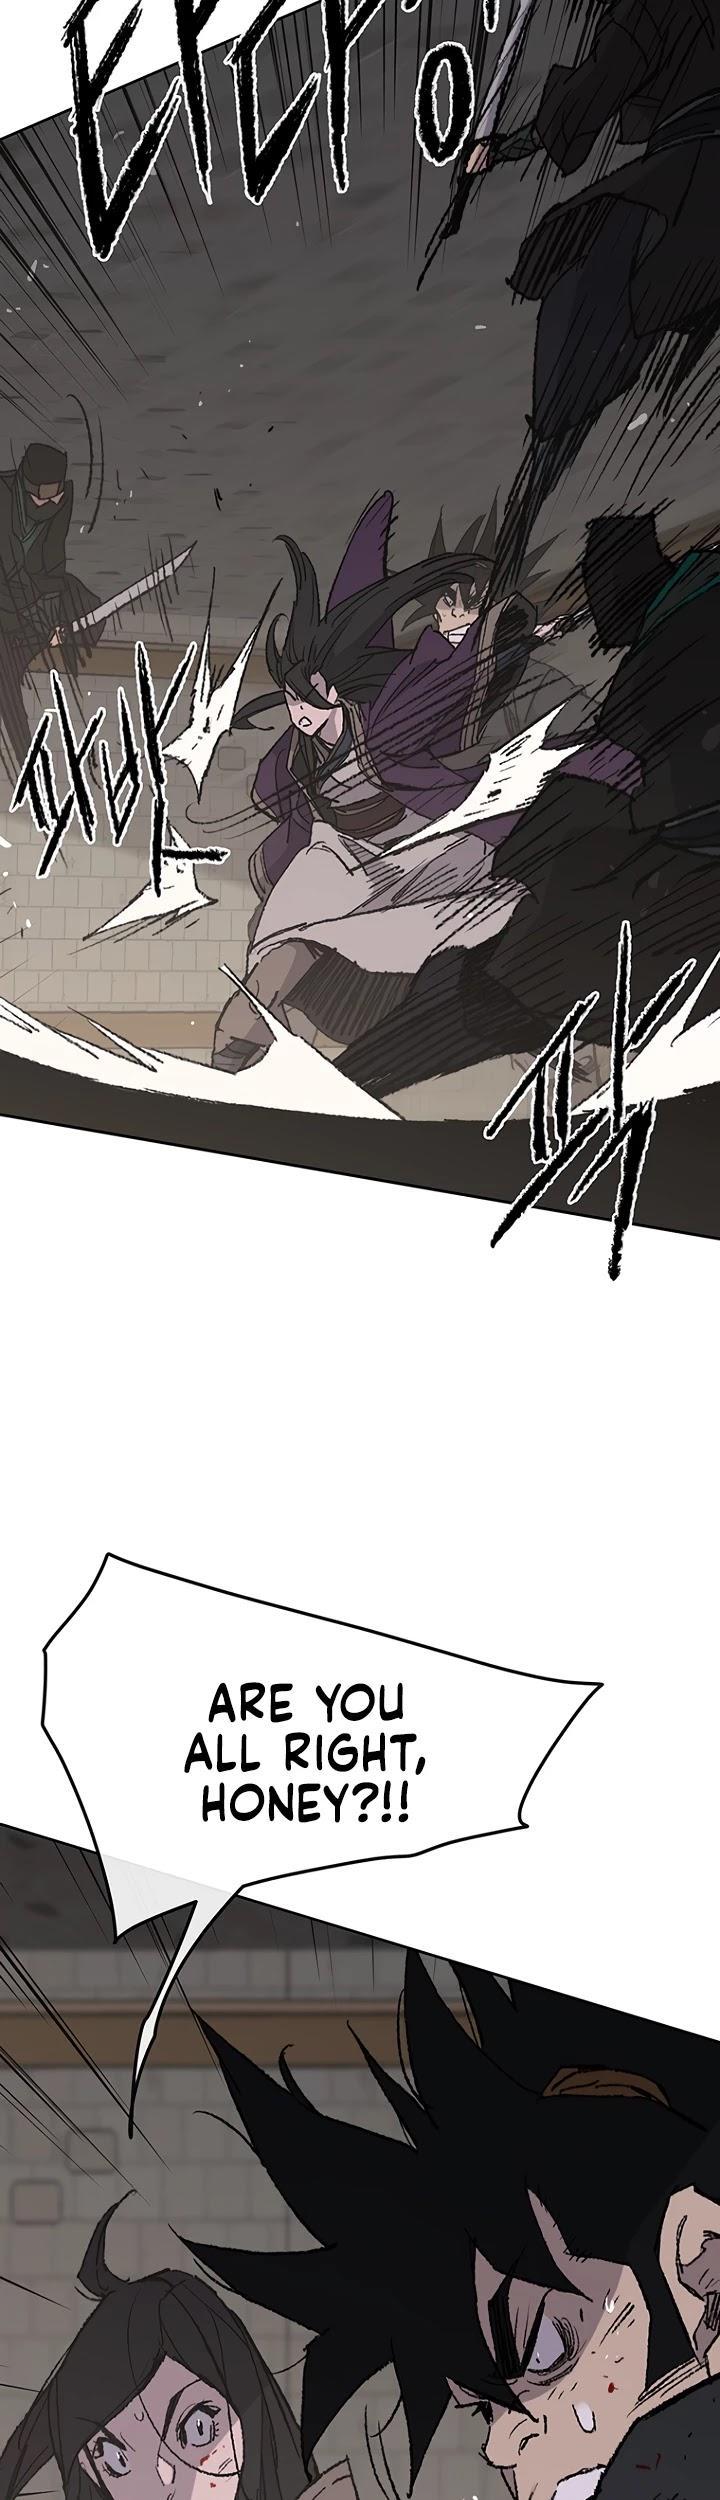 The Undefeatable Swordsman Chapter 73 page 31 - Mangakakalots.com